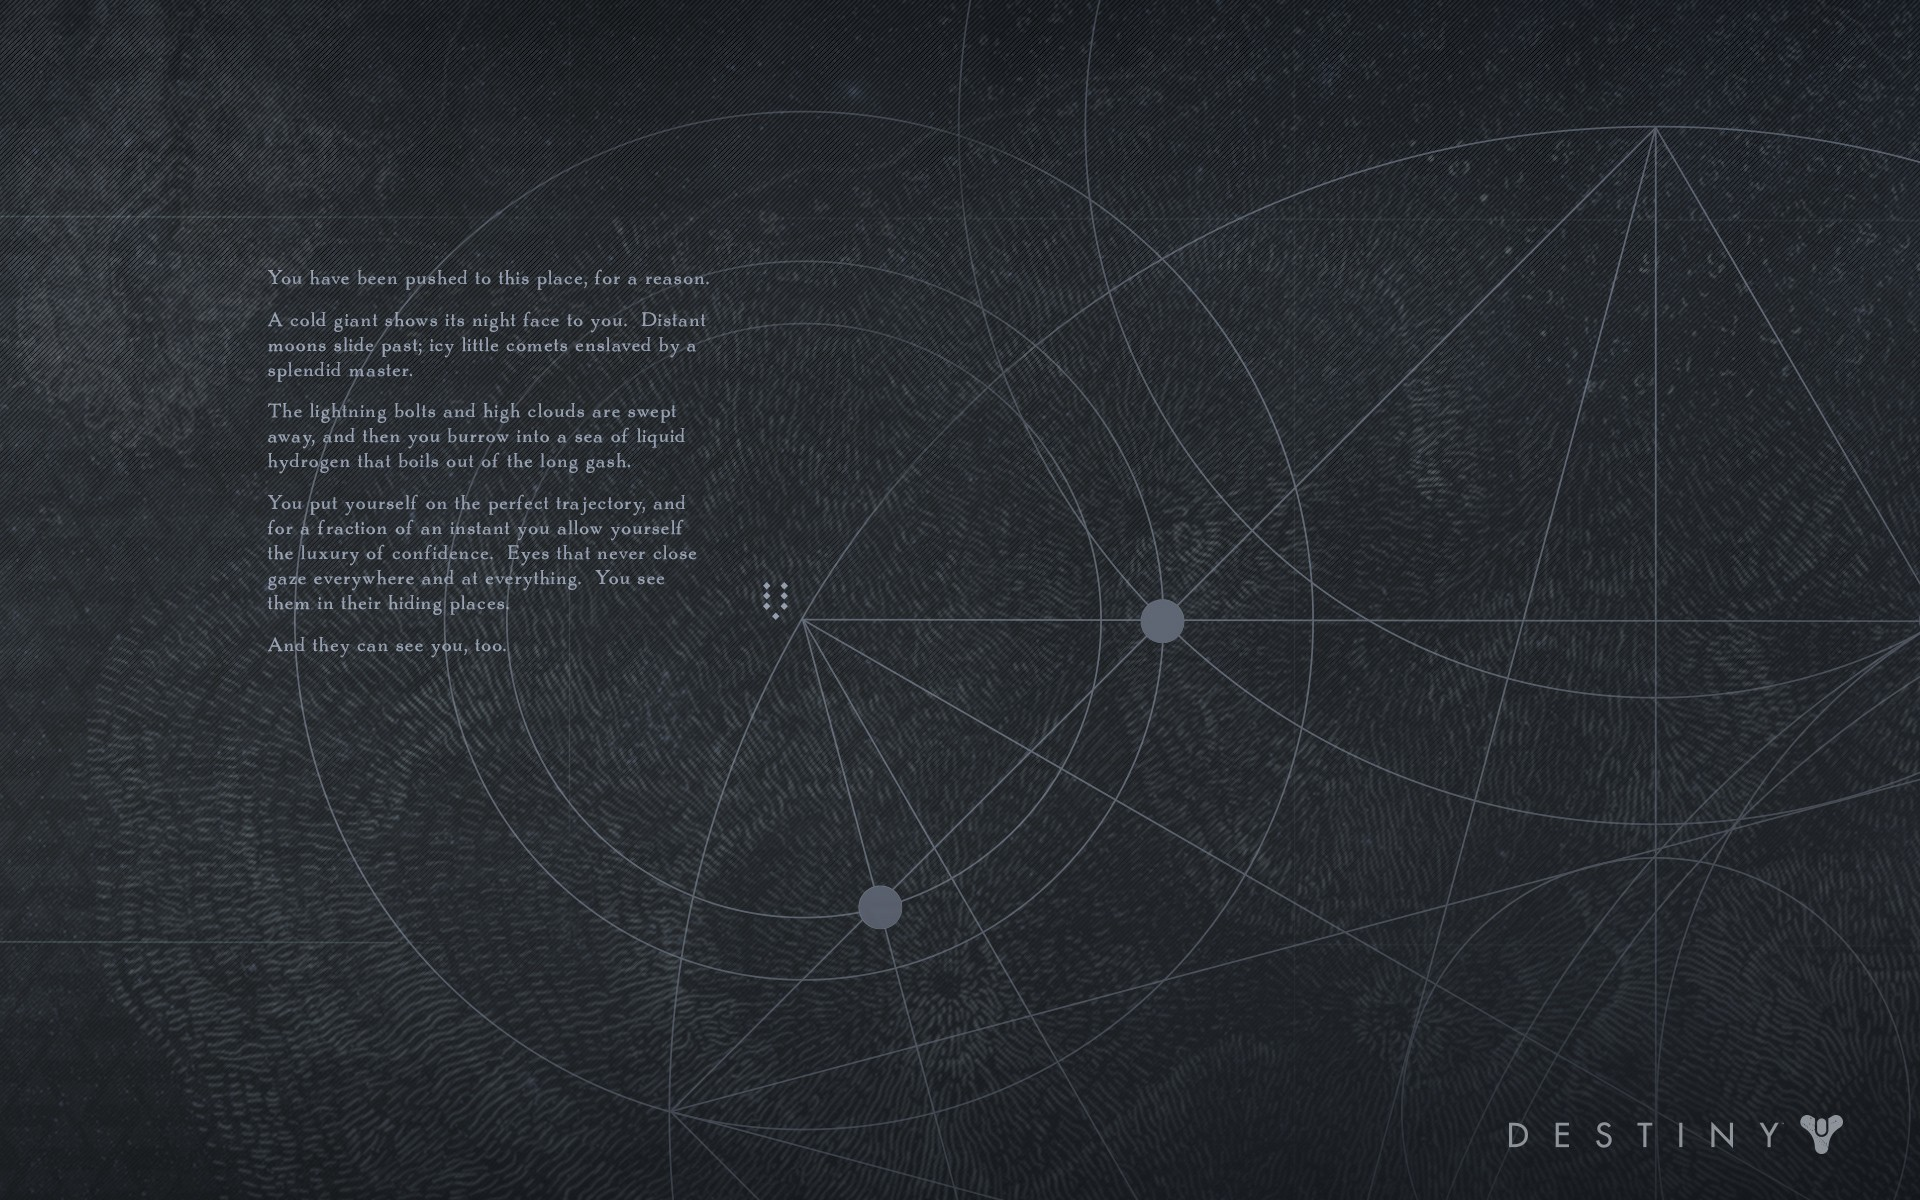 All Black Xbox One S Wallpaper: Destiny Wallpaper For Xbox One